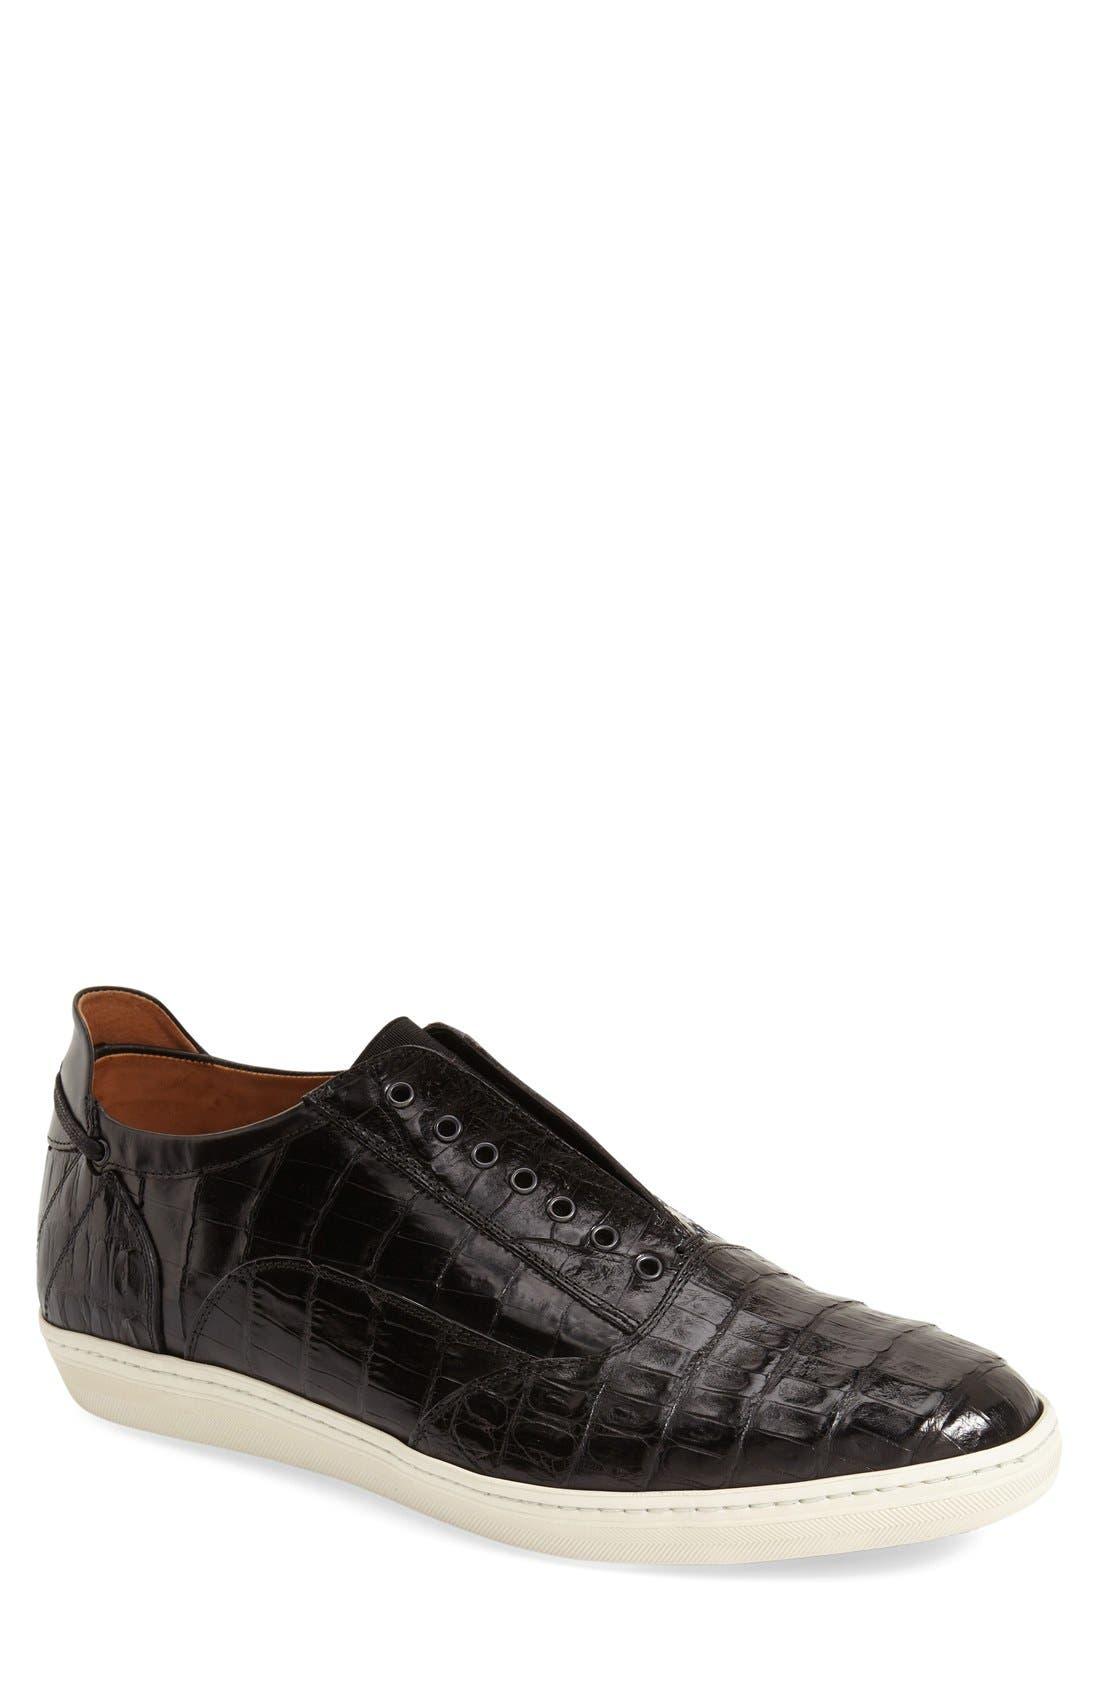 'Emmanuel' Slip-on Sneaker,                         Main,                         color,